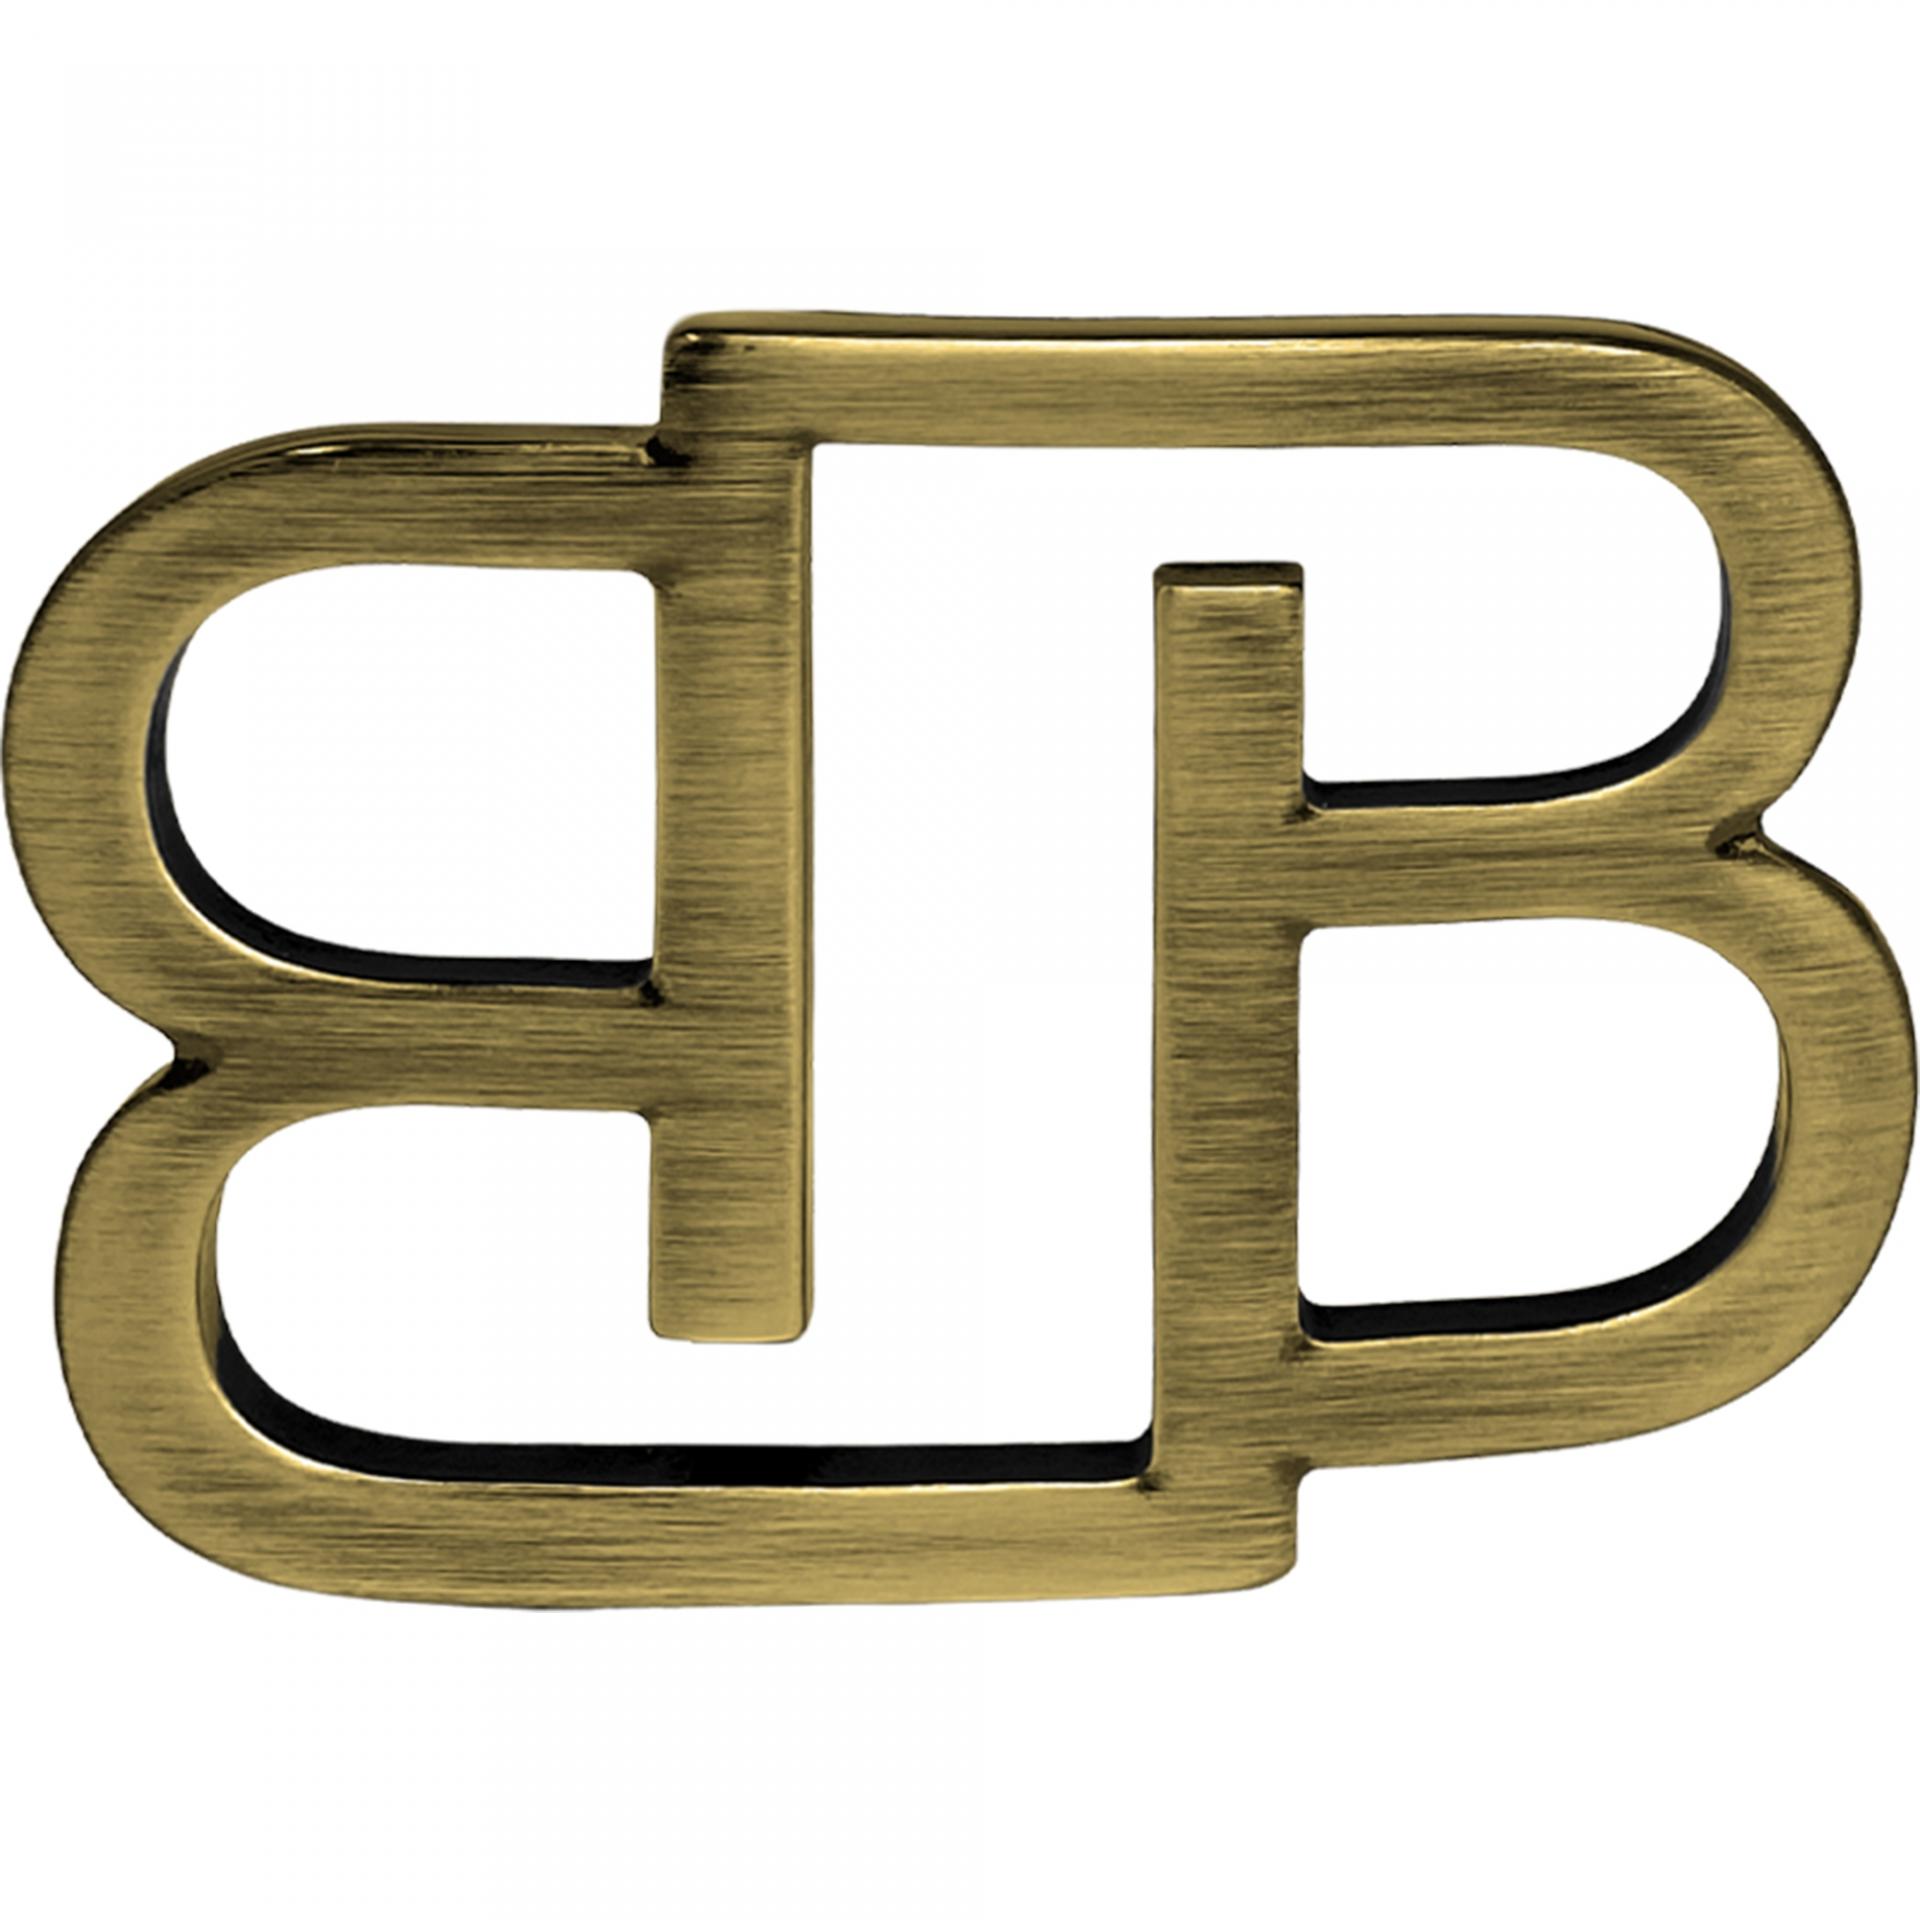 BB Buckle nickel free 35 mm, bronze satin